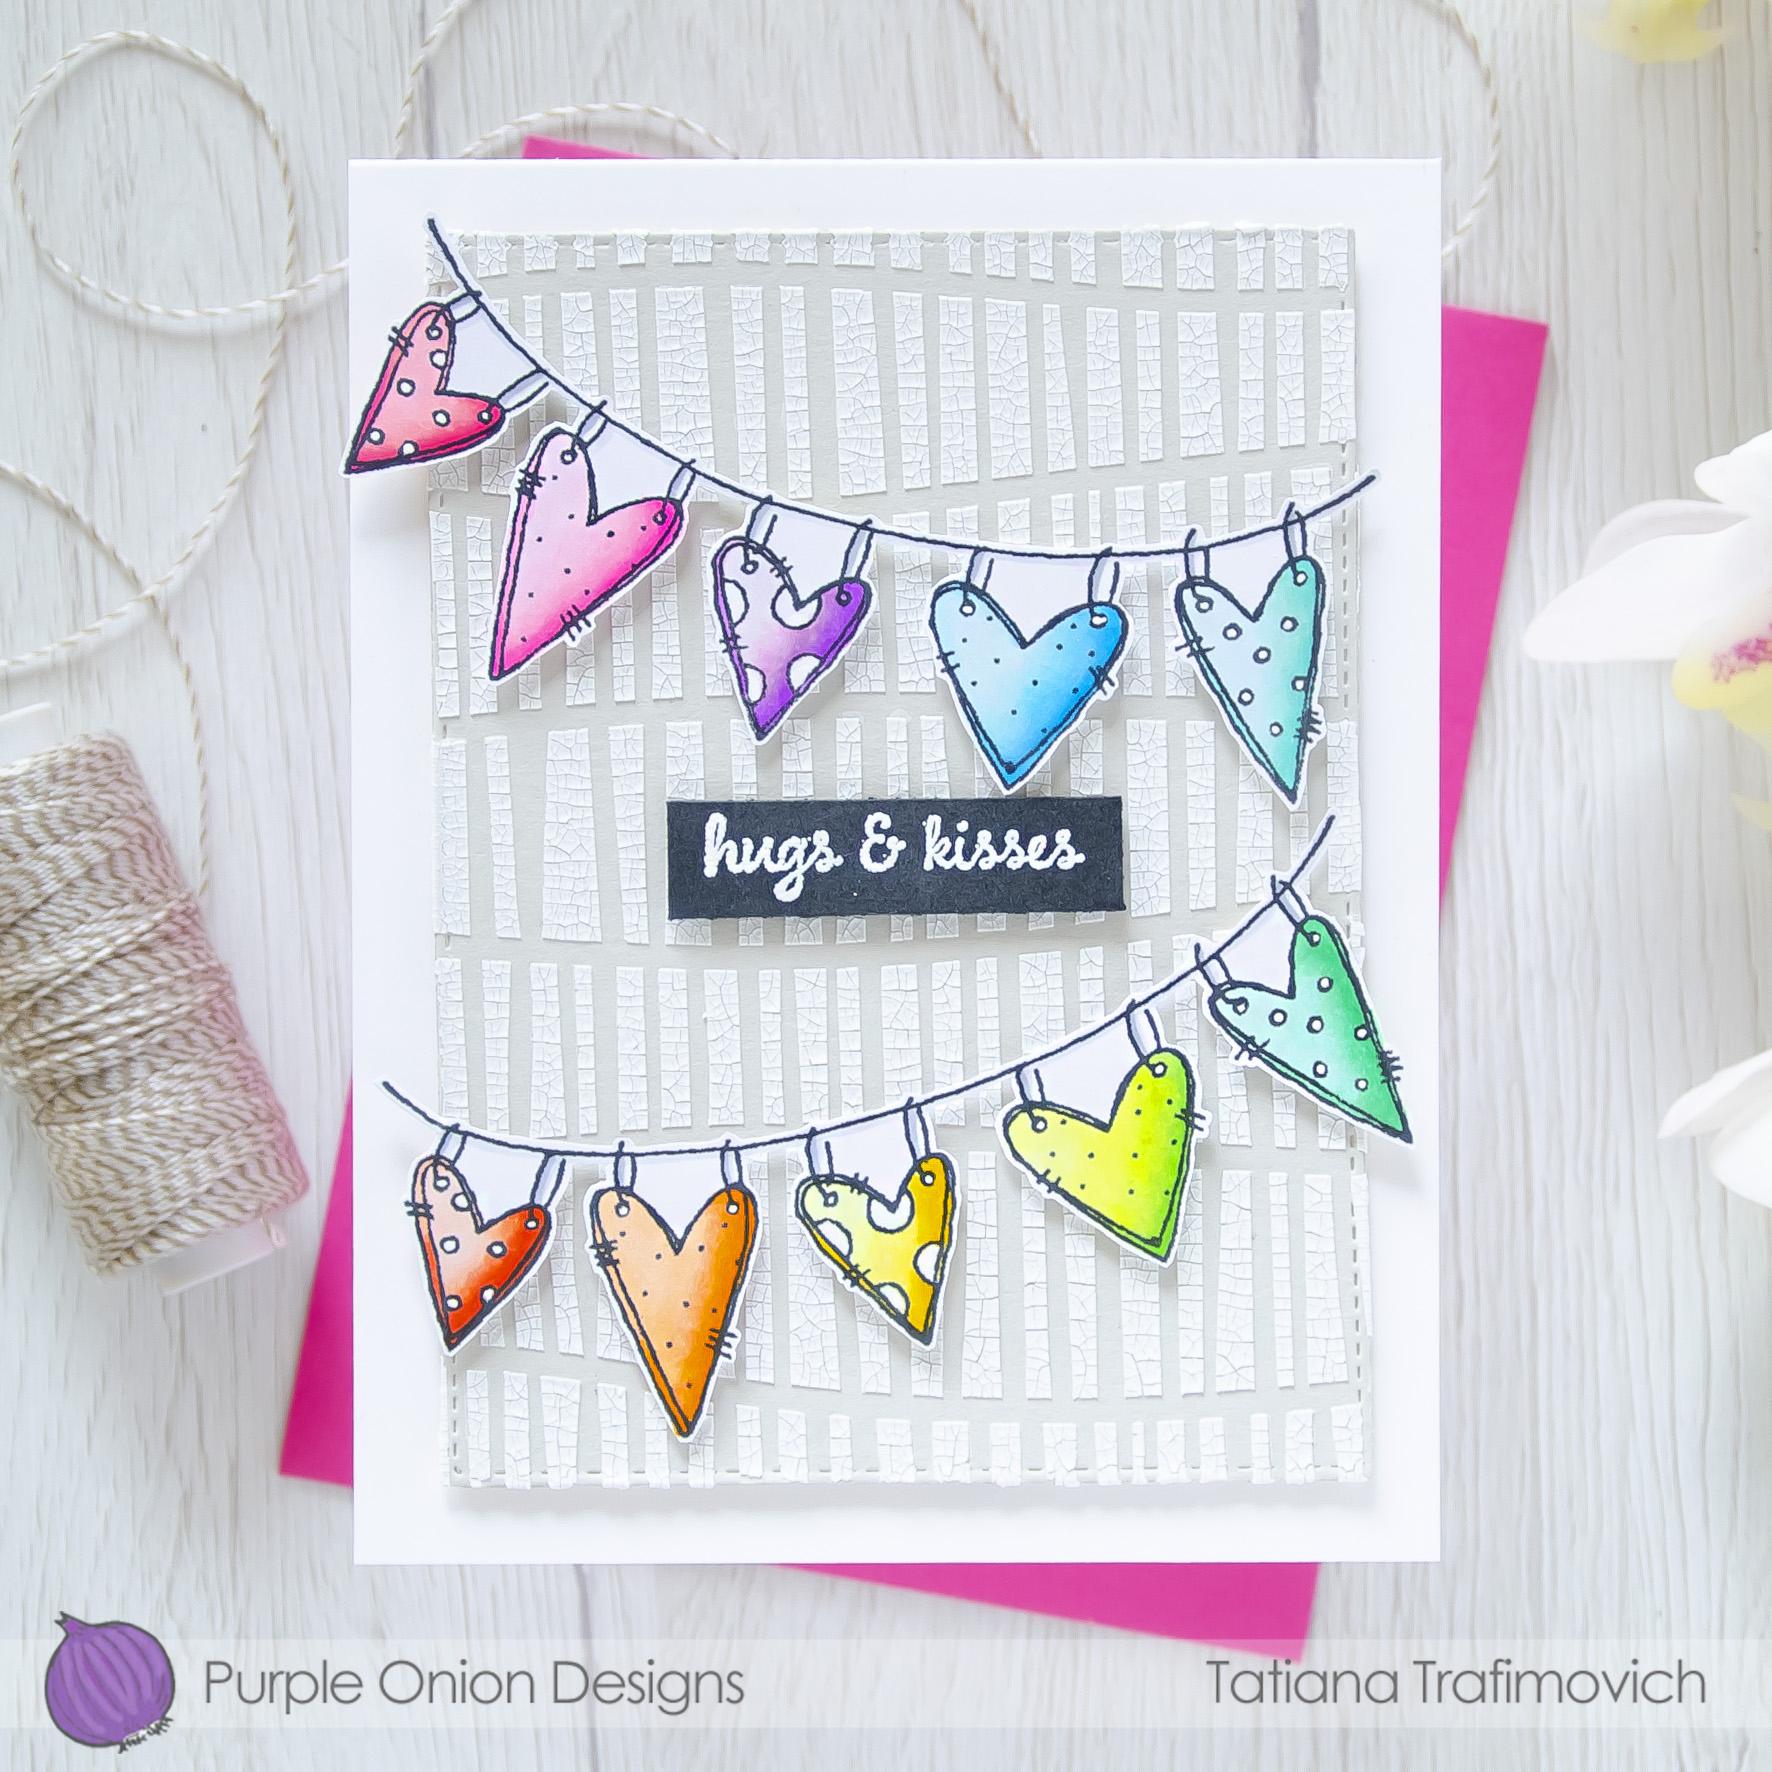 Hugs & Kisses #handmade card by Tatiana Trafimovich #tatianacraftandart - stamps by Purple Onion Designs